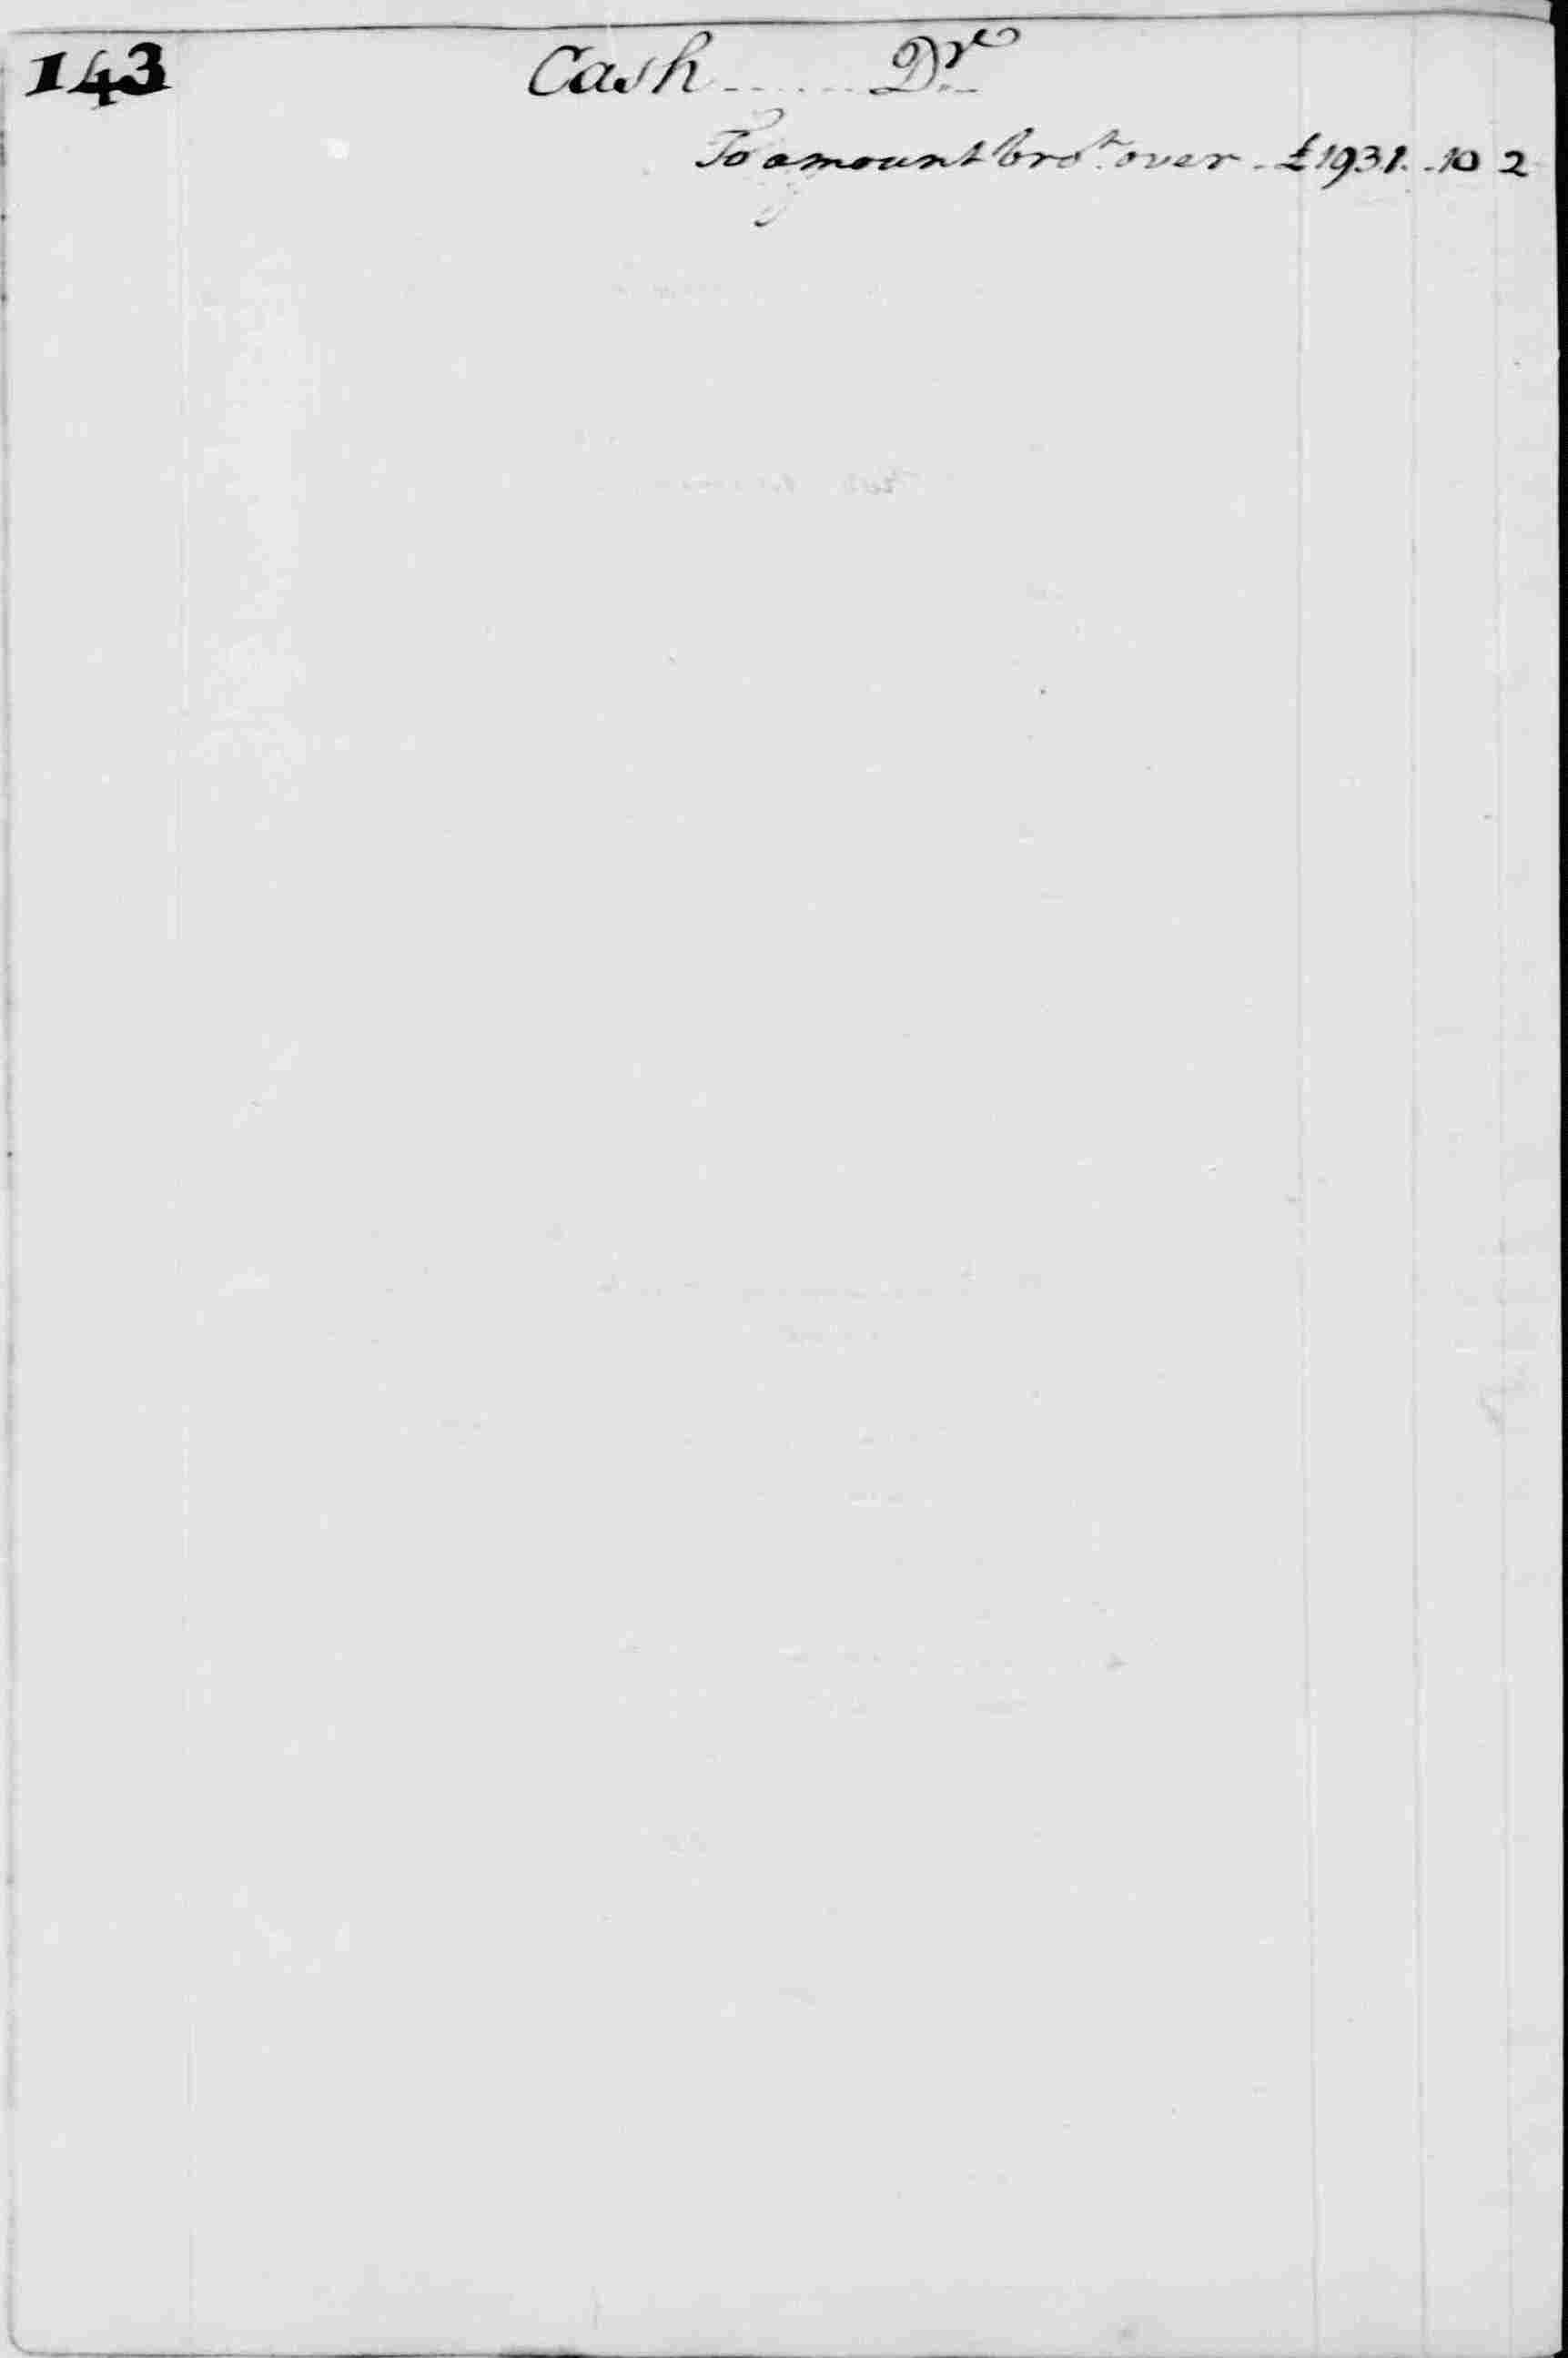 Ledger A, folio 143, left side